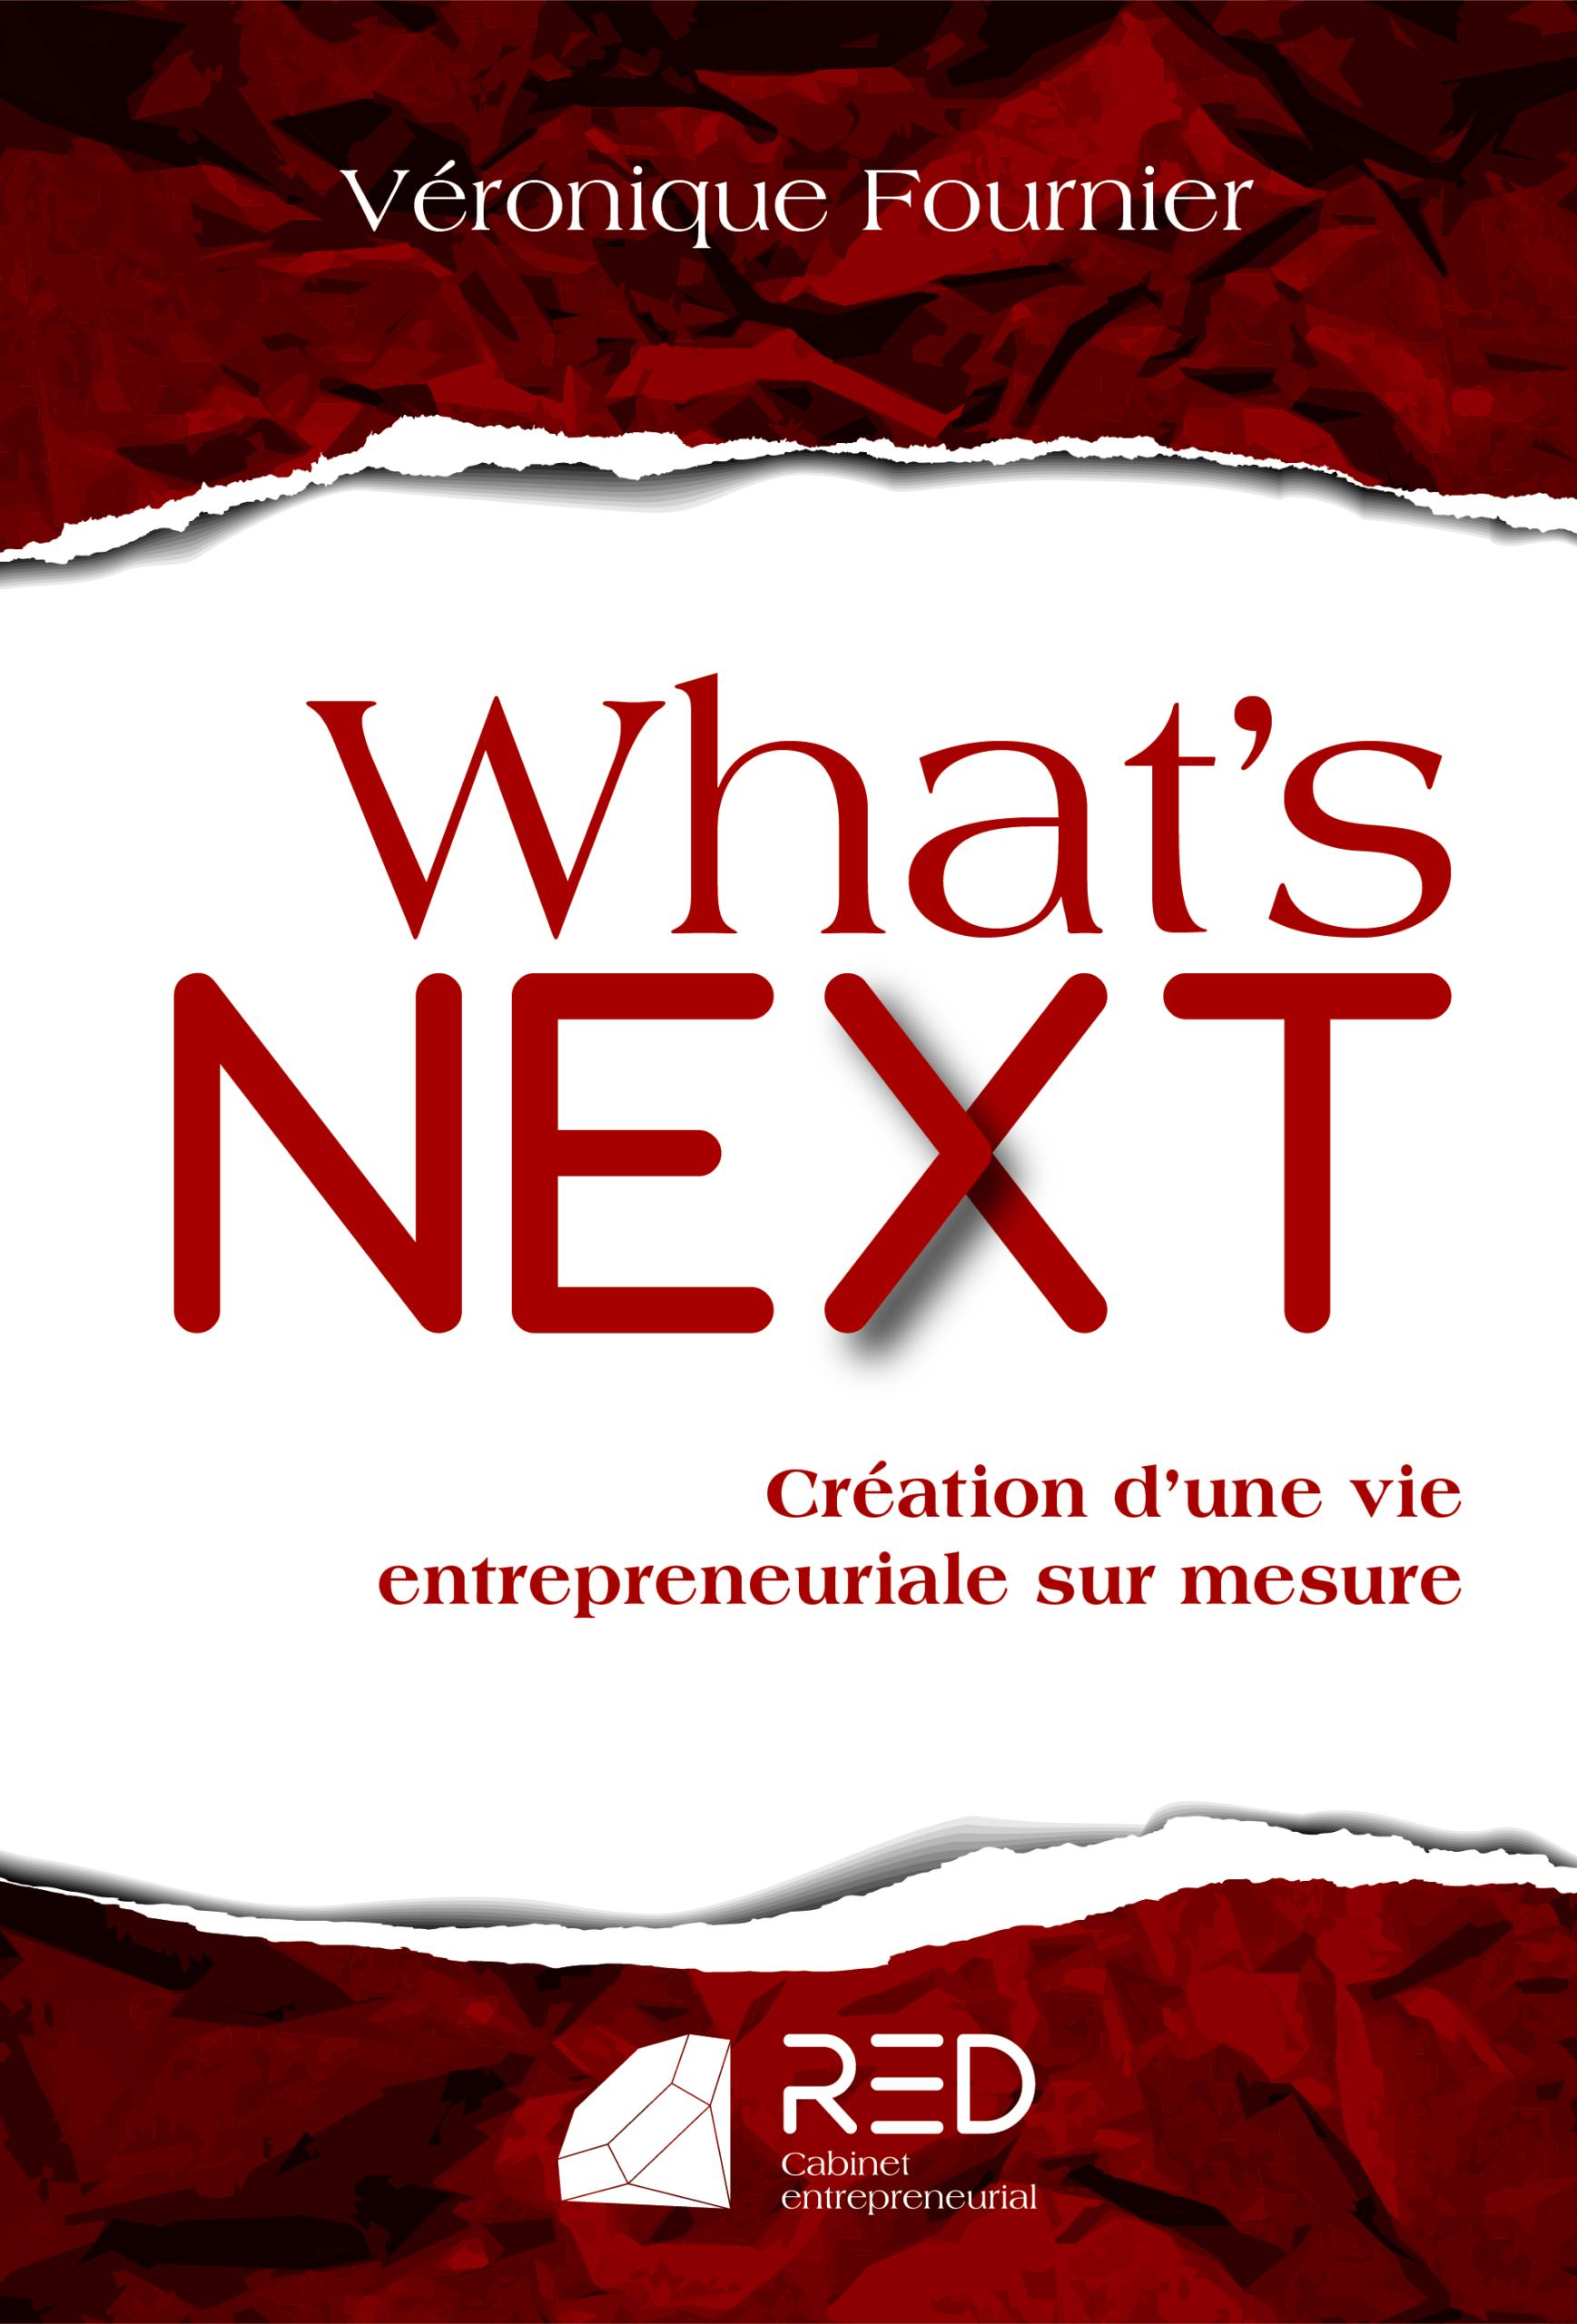 Creation vie entrepreneuriale sur mesure